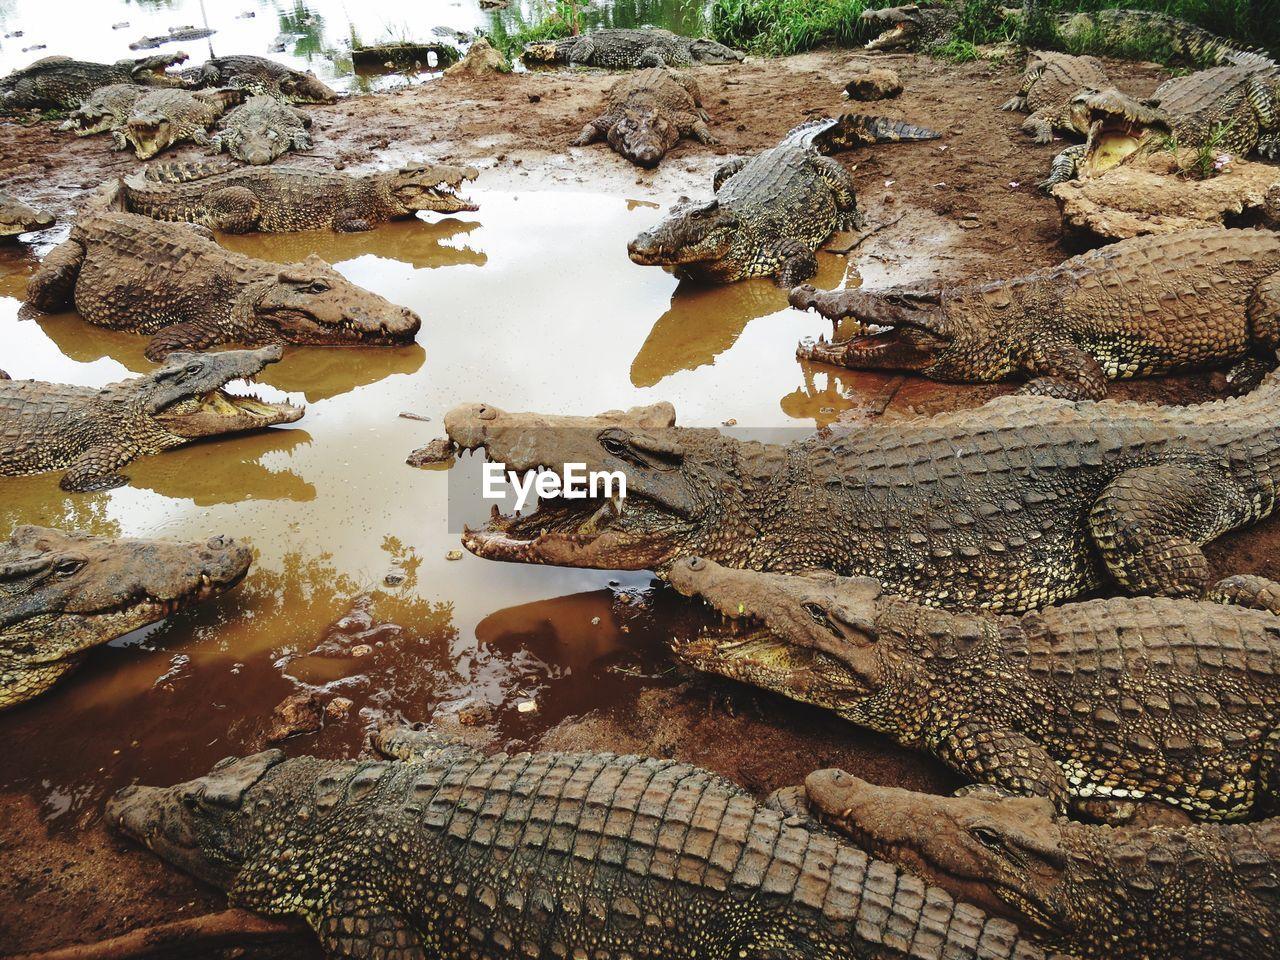 High angle view of crocodiles at lakeshore